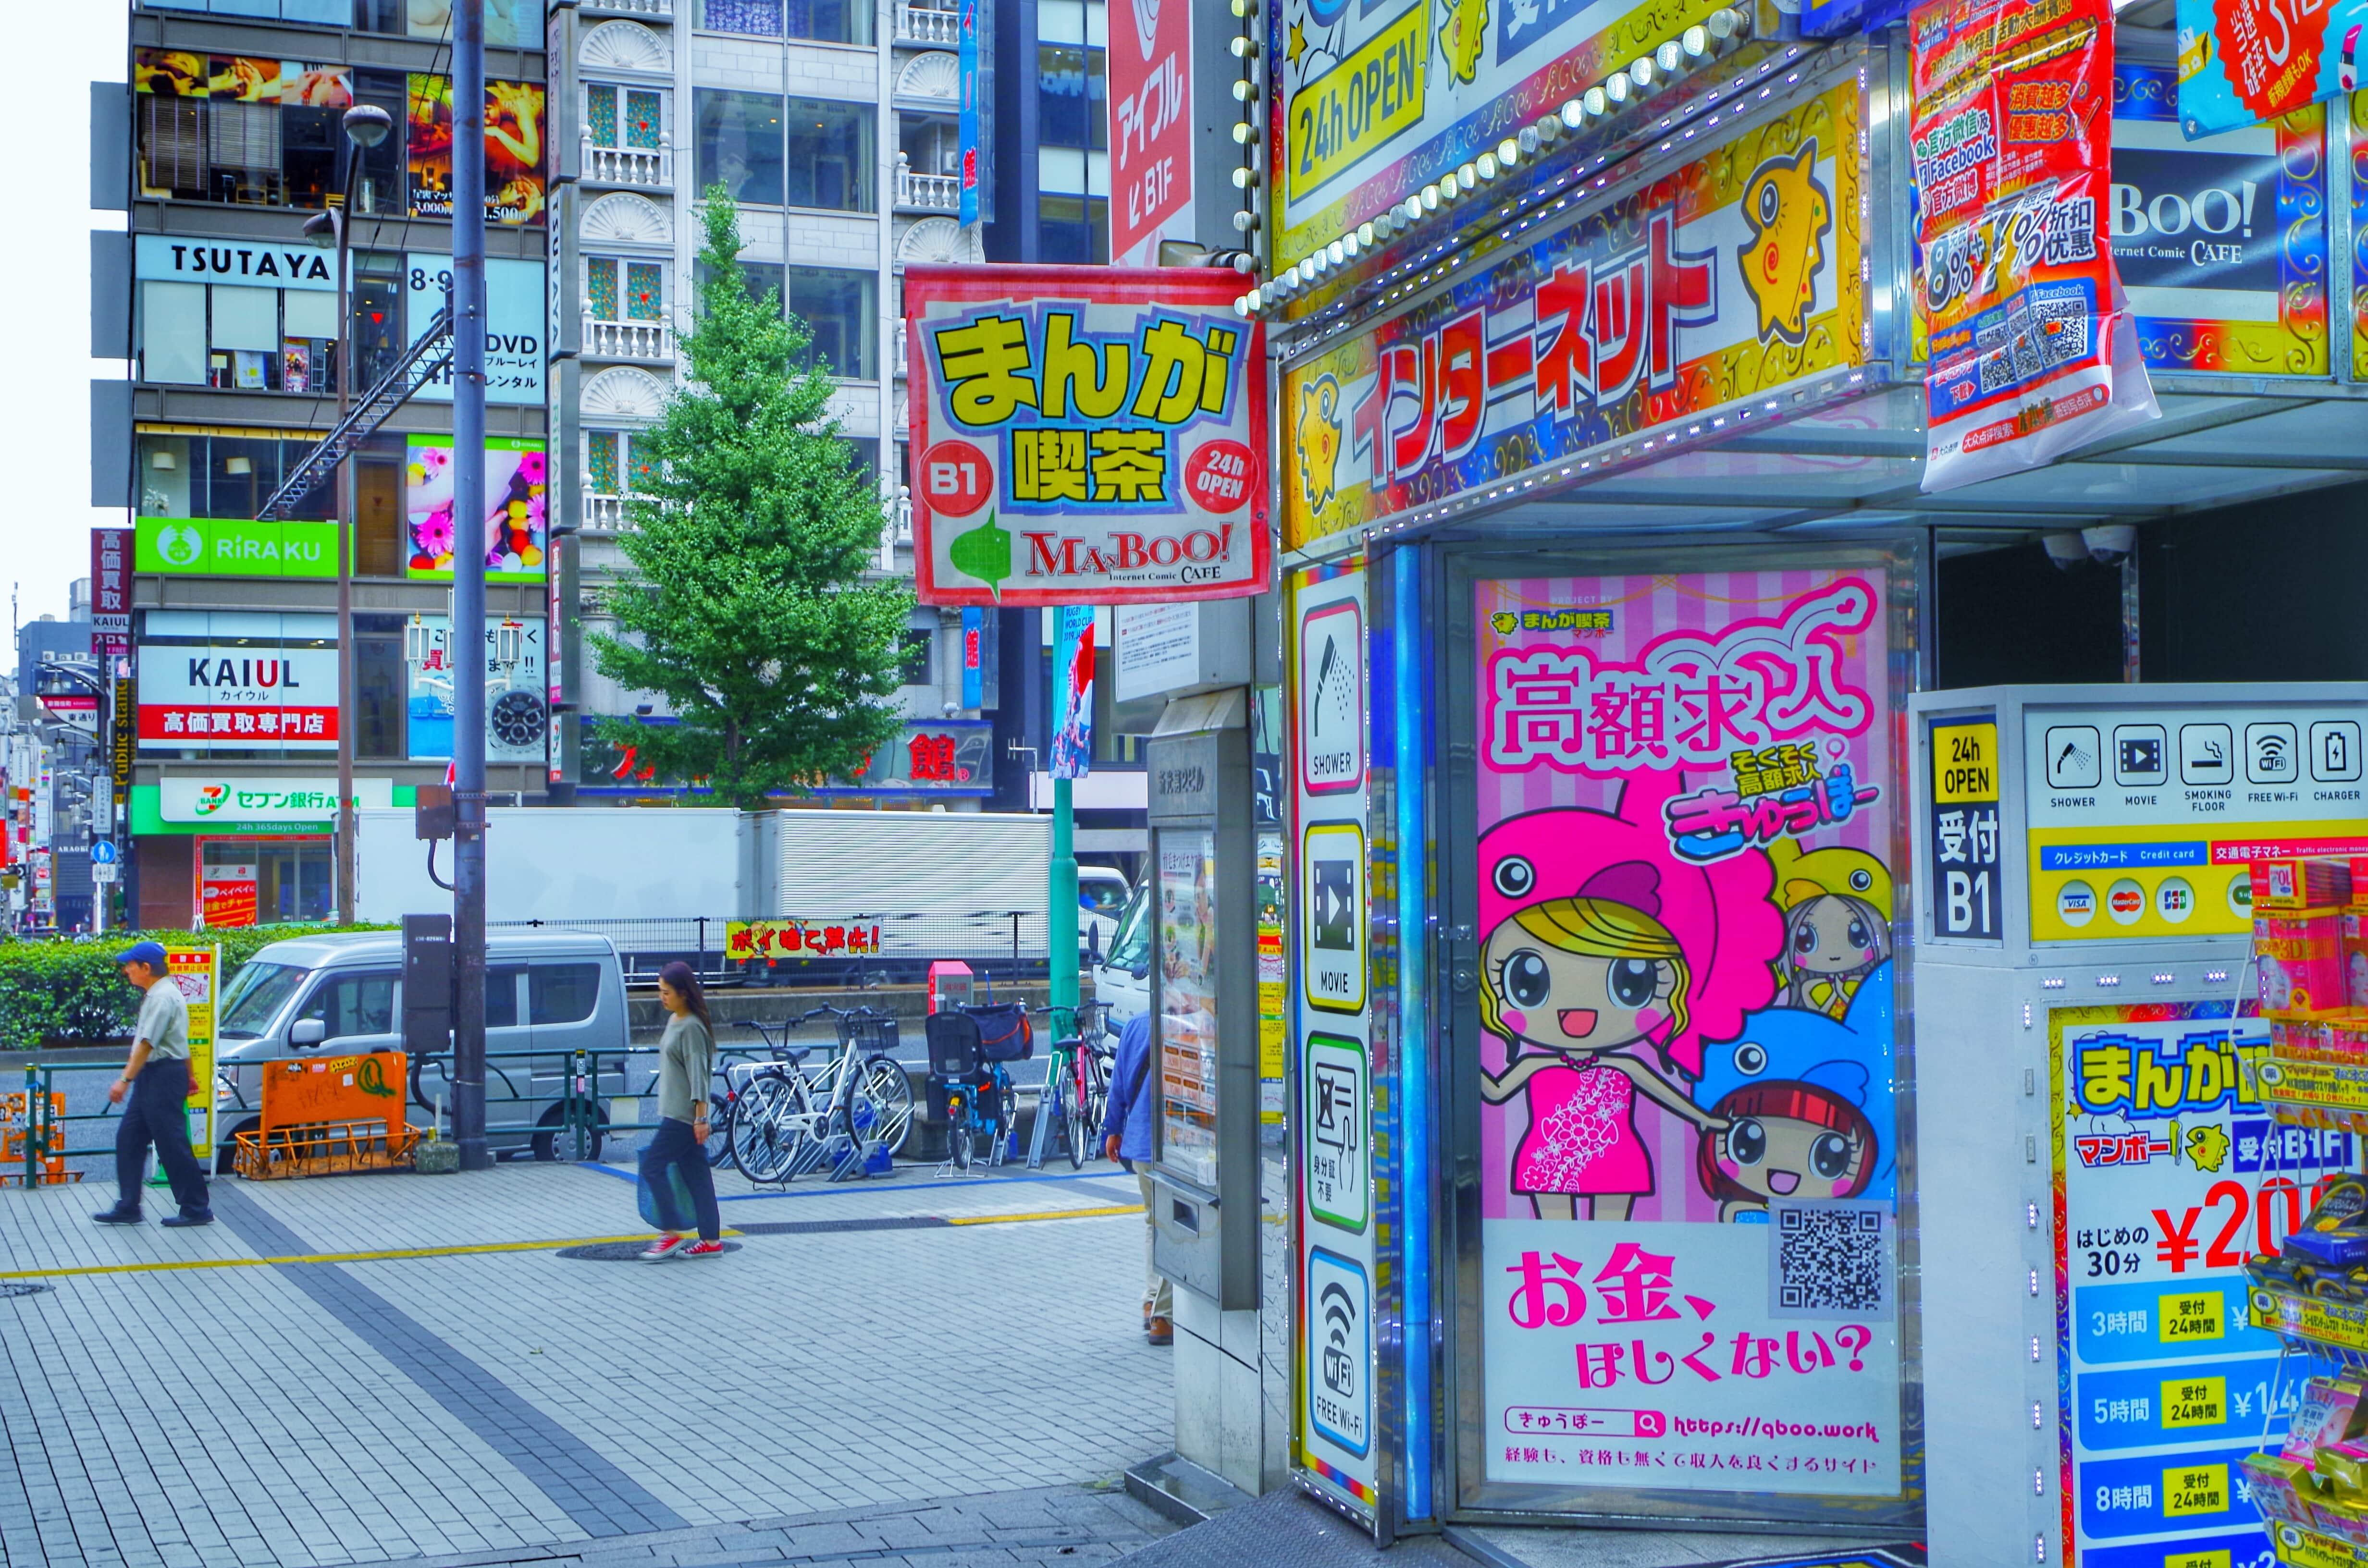 Manboo Shinjuku Yasukuni-dori (マンボー新宿靖国通り店)